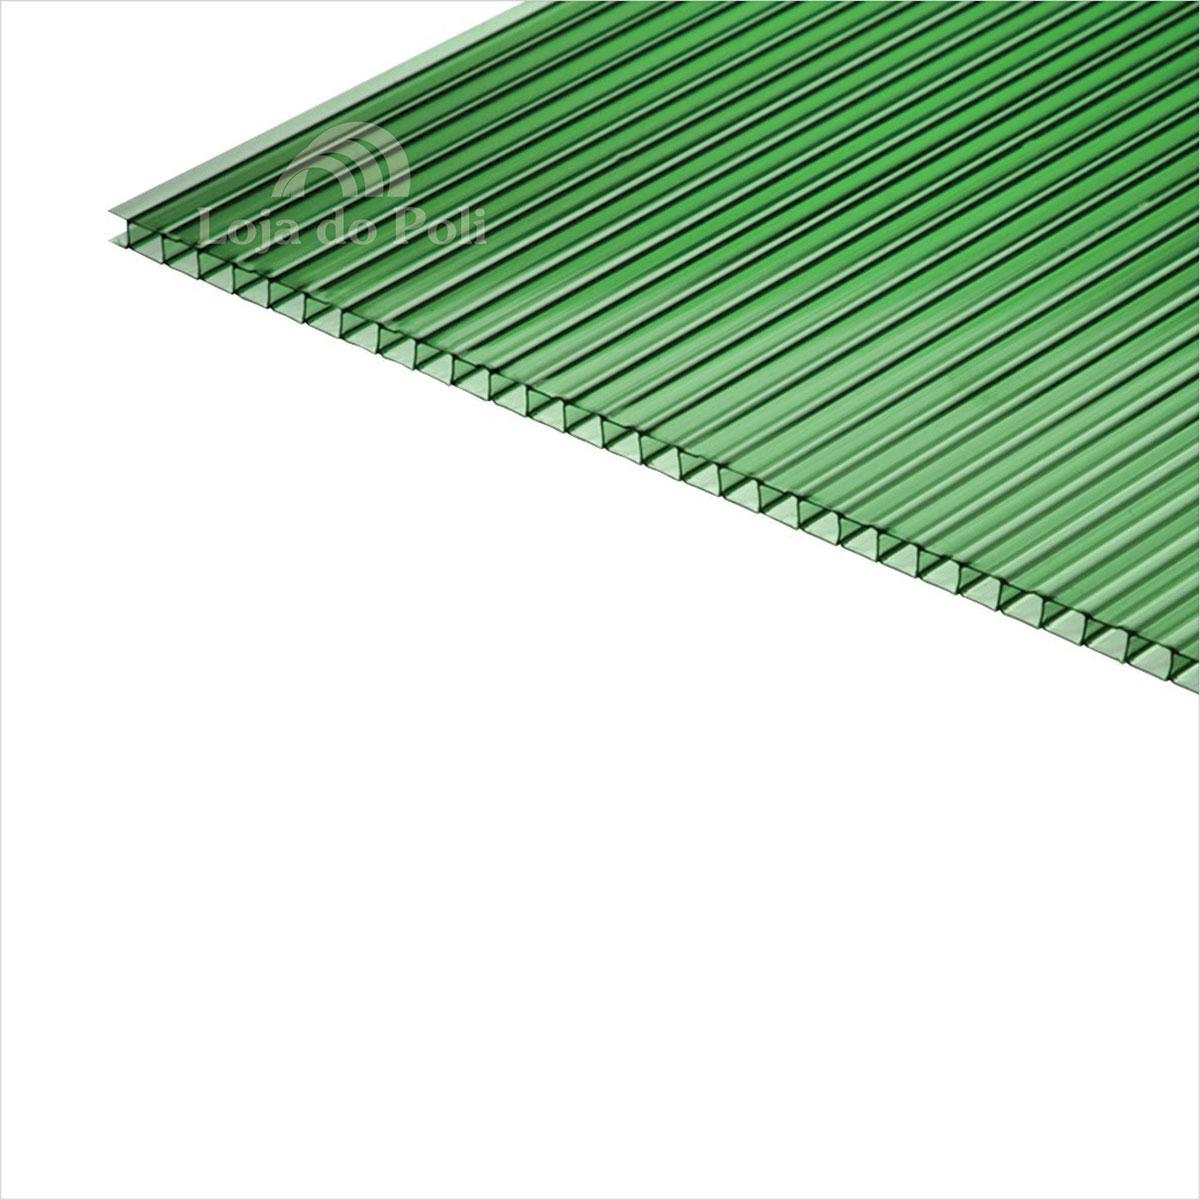 Chapa Policarbonato Alveolar Verde 4mm 2,1x6,0m